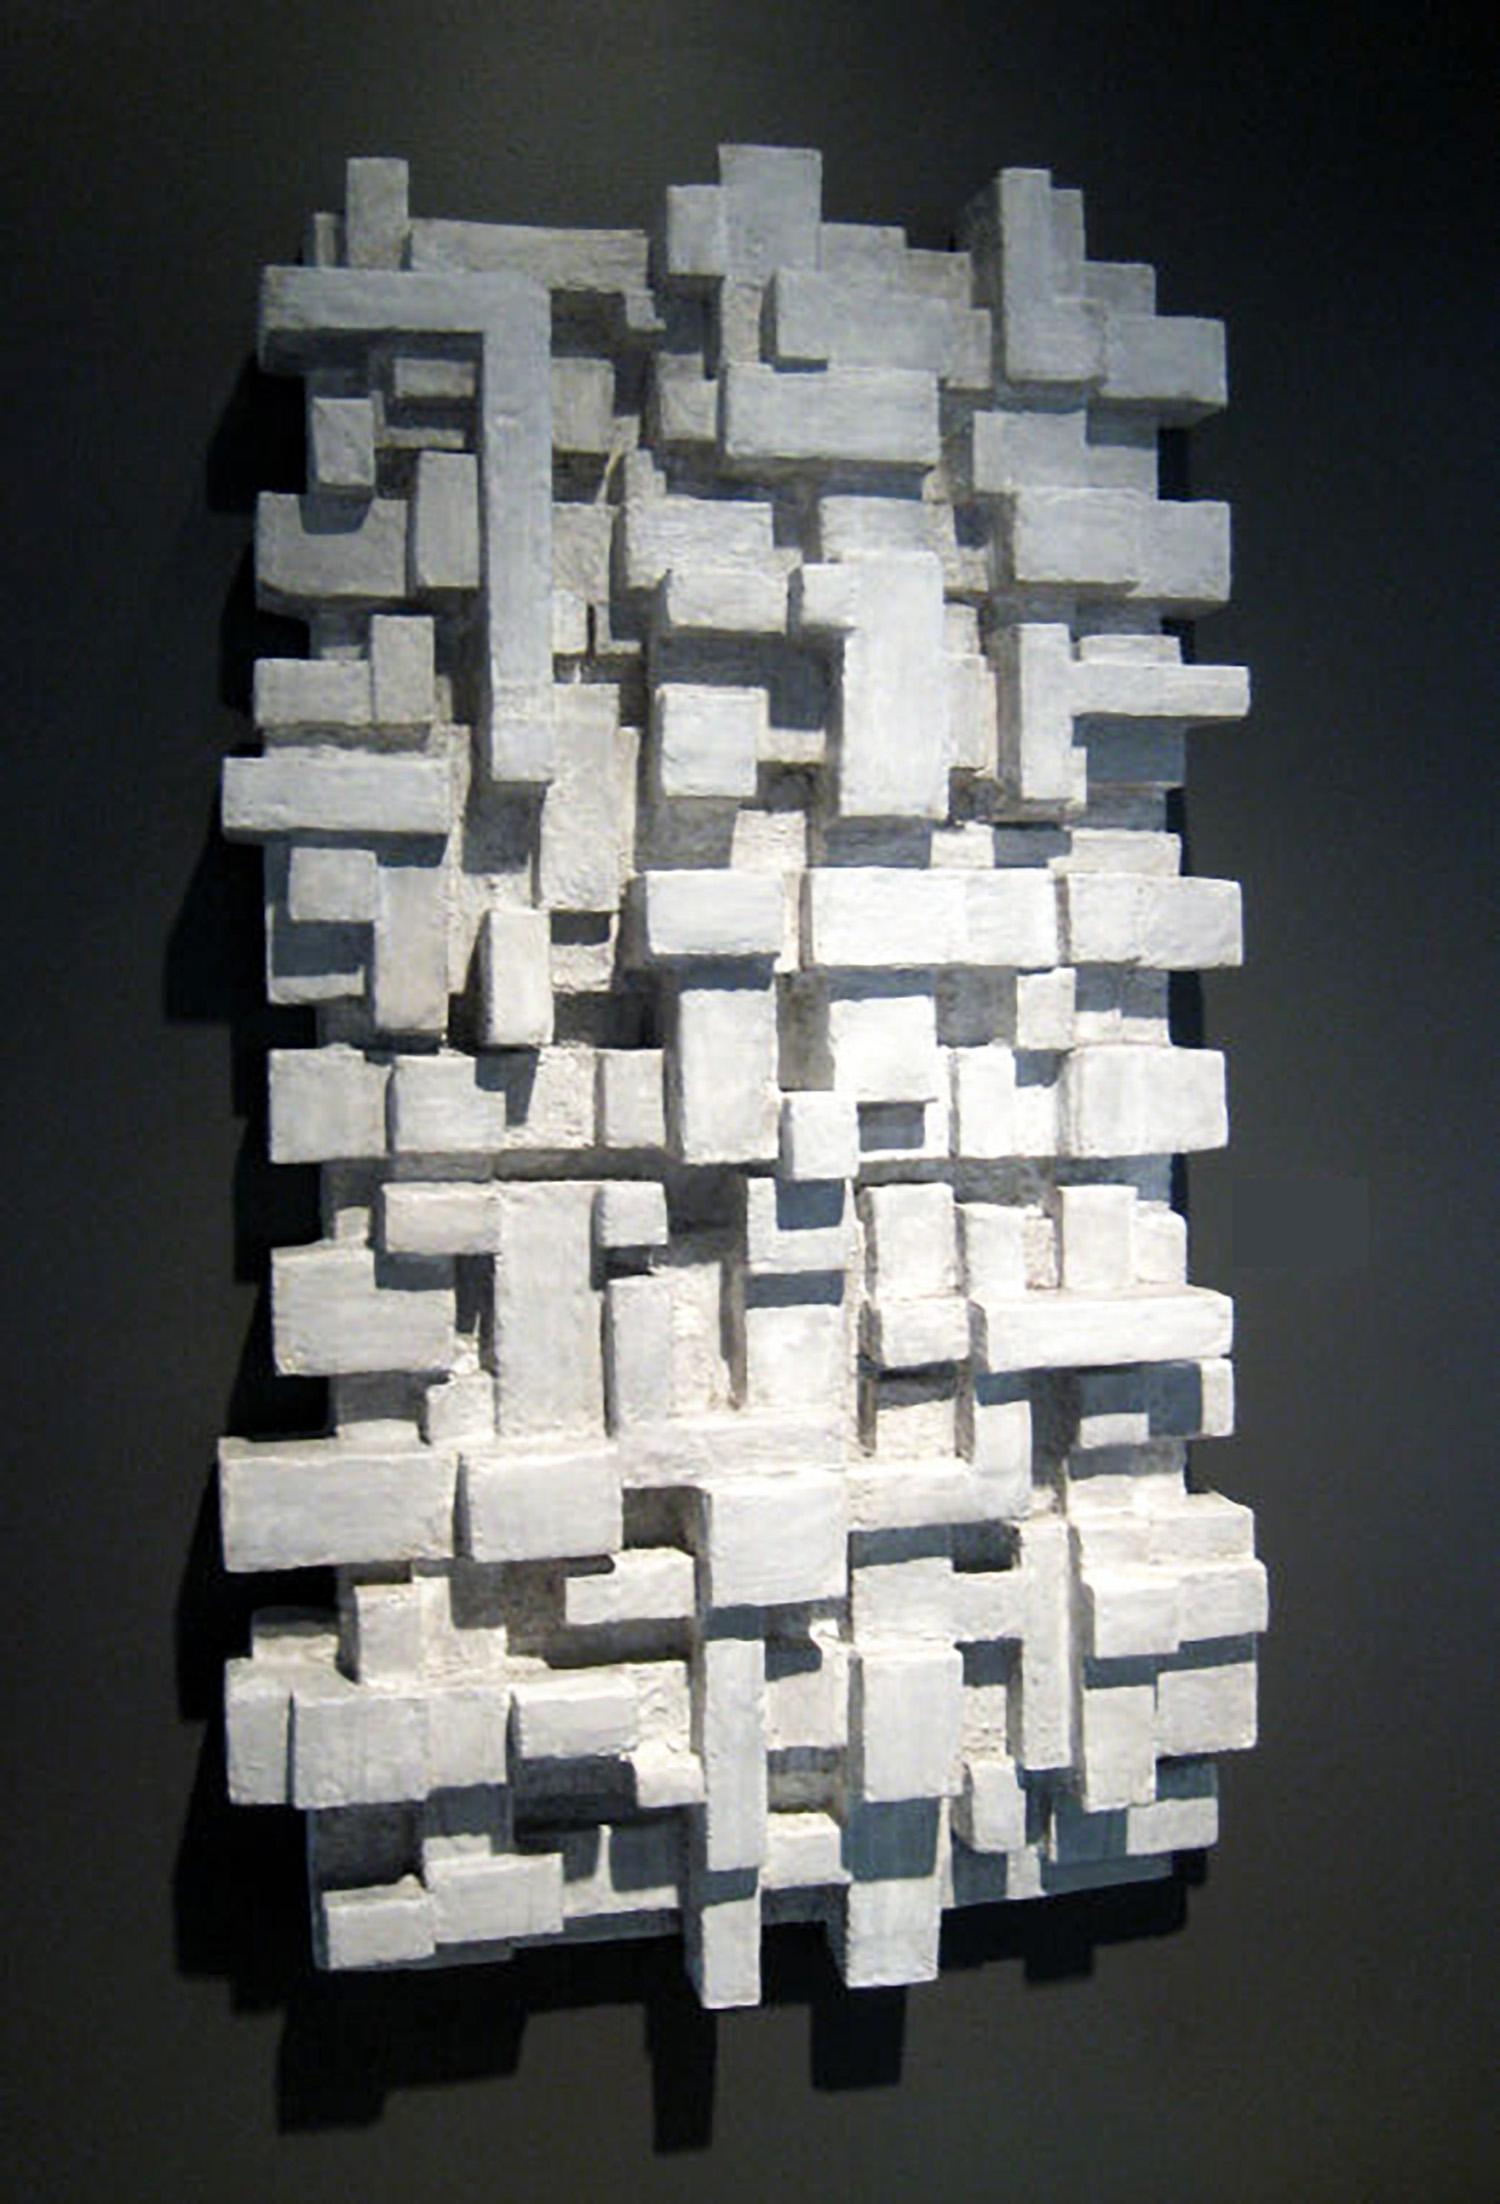 "BRIE SOLEIL, Mixed Media, 30"" x 48"" x 8"", 2012"